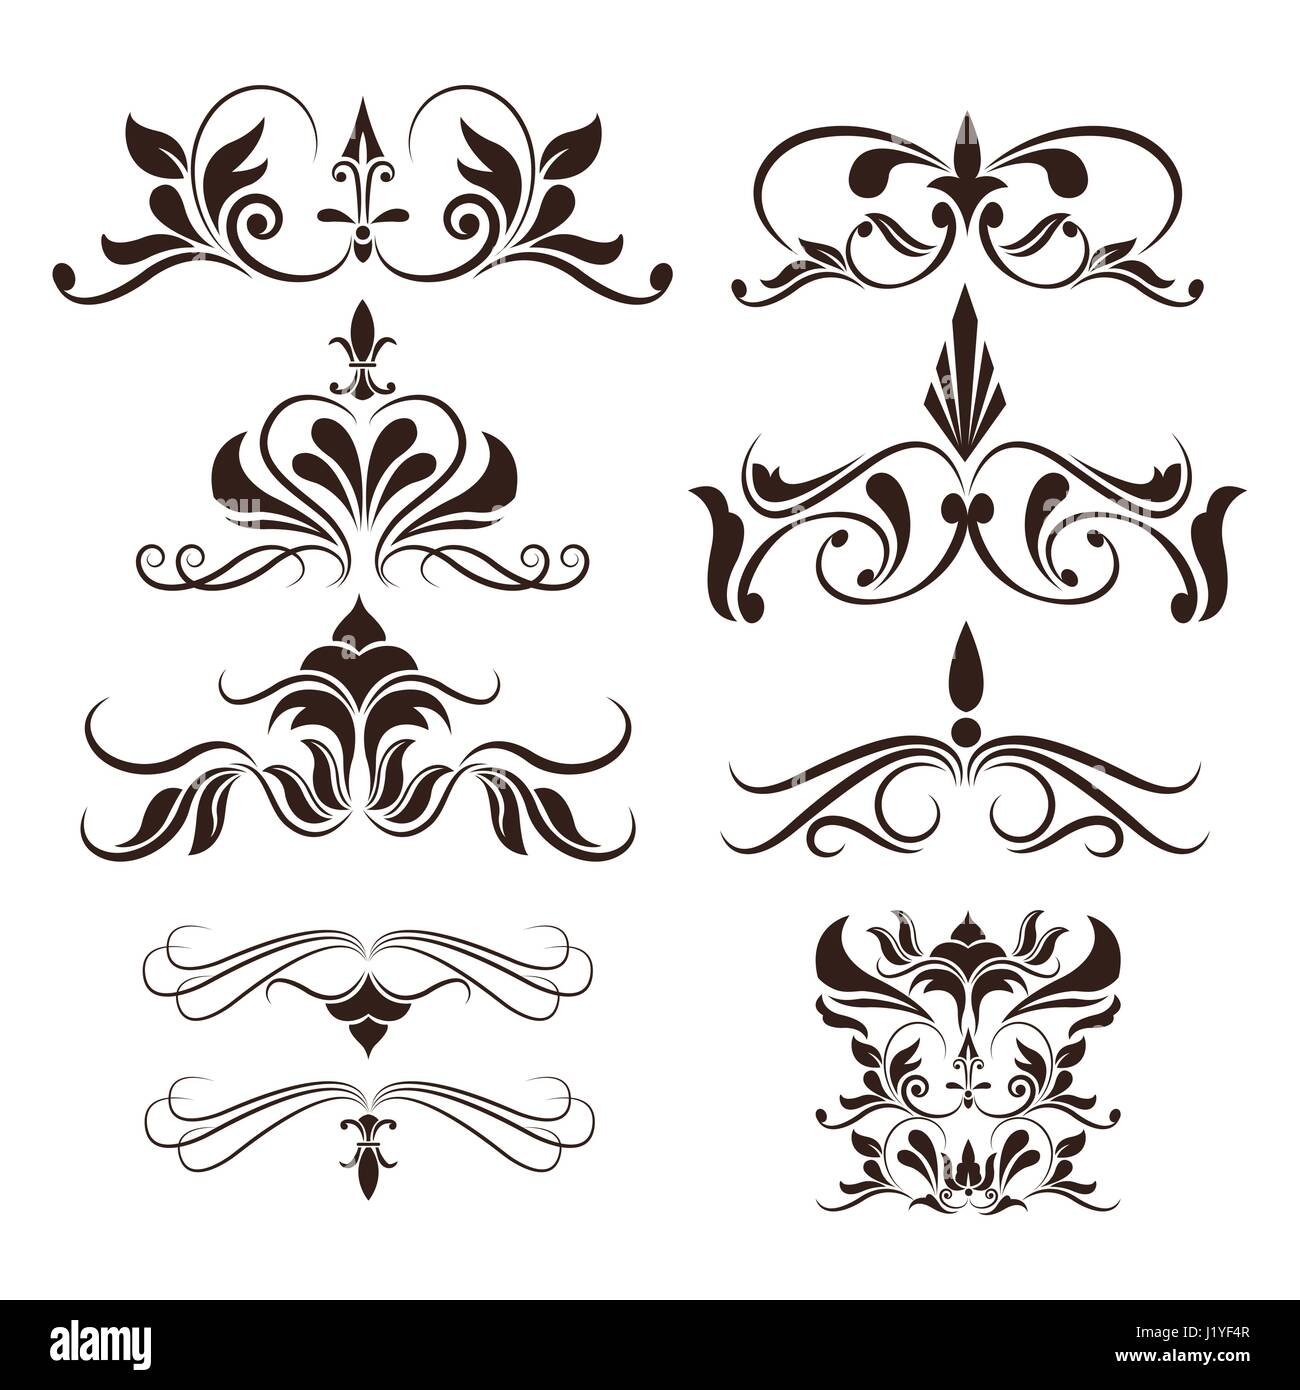 swirls element decorative vintage collection design - Stock Image